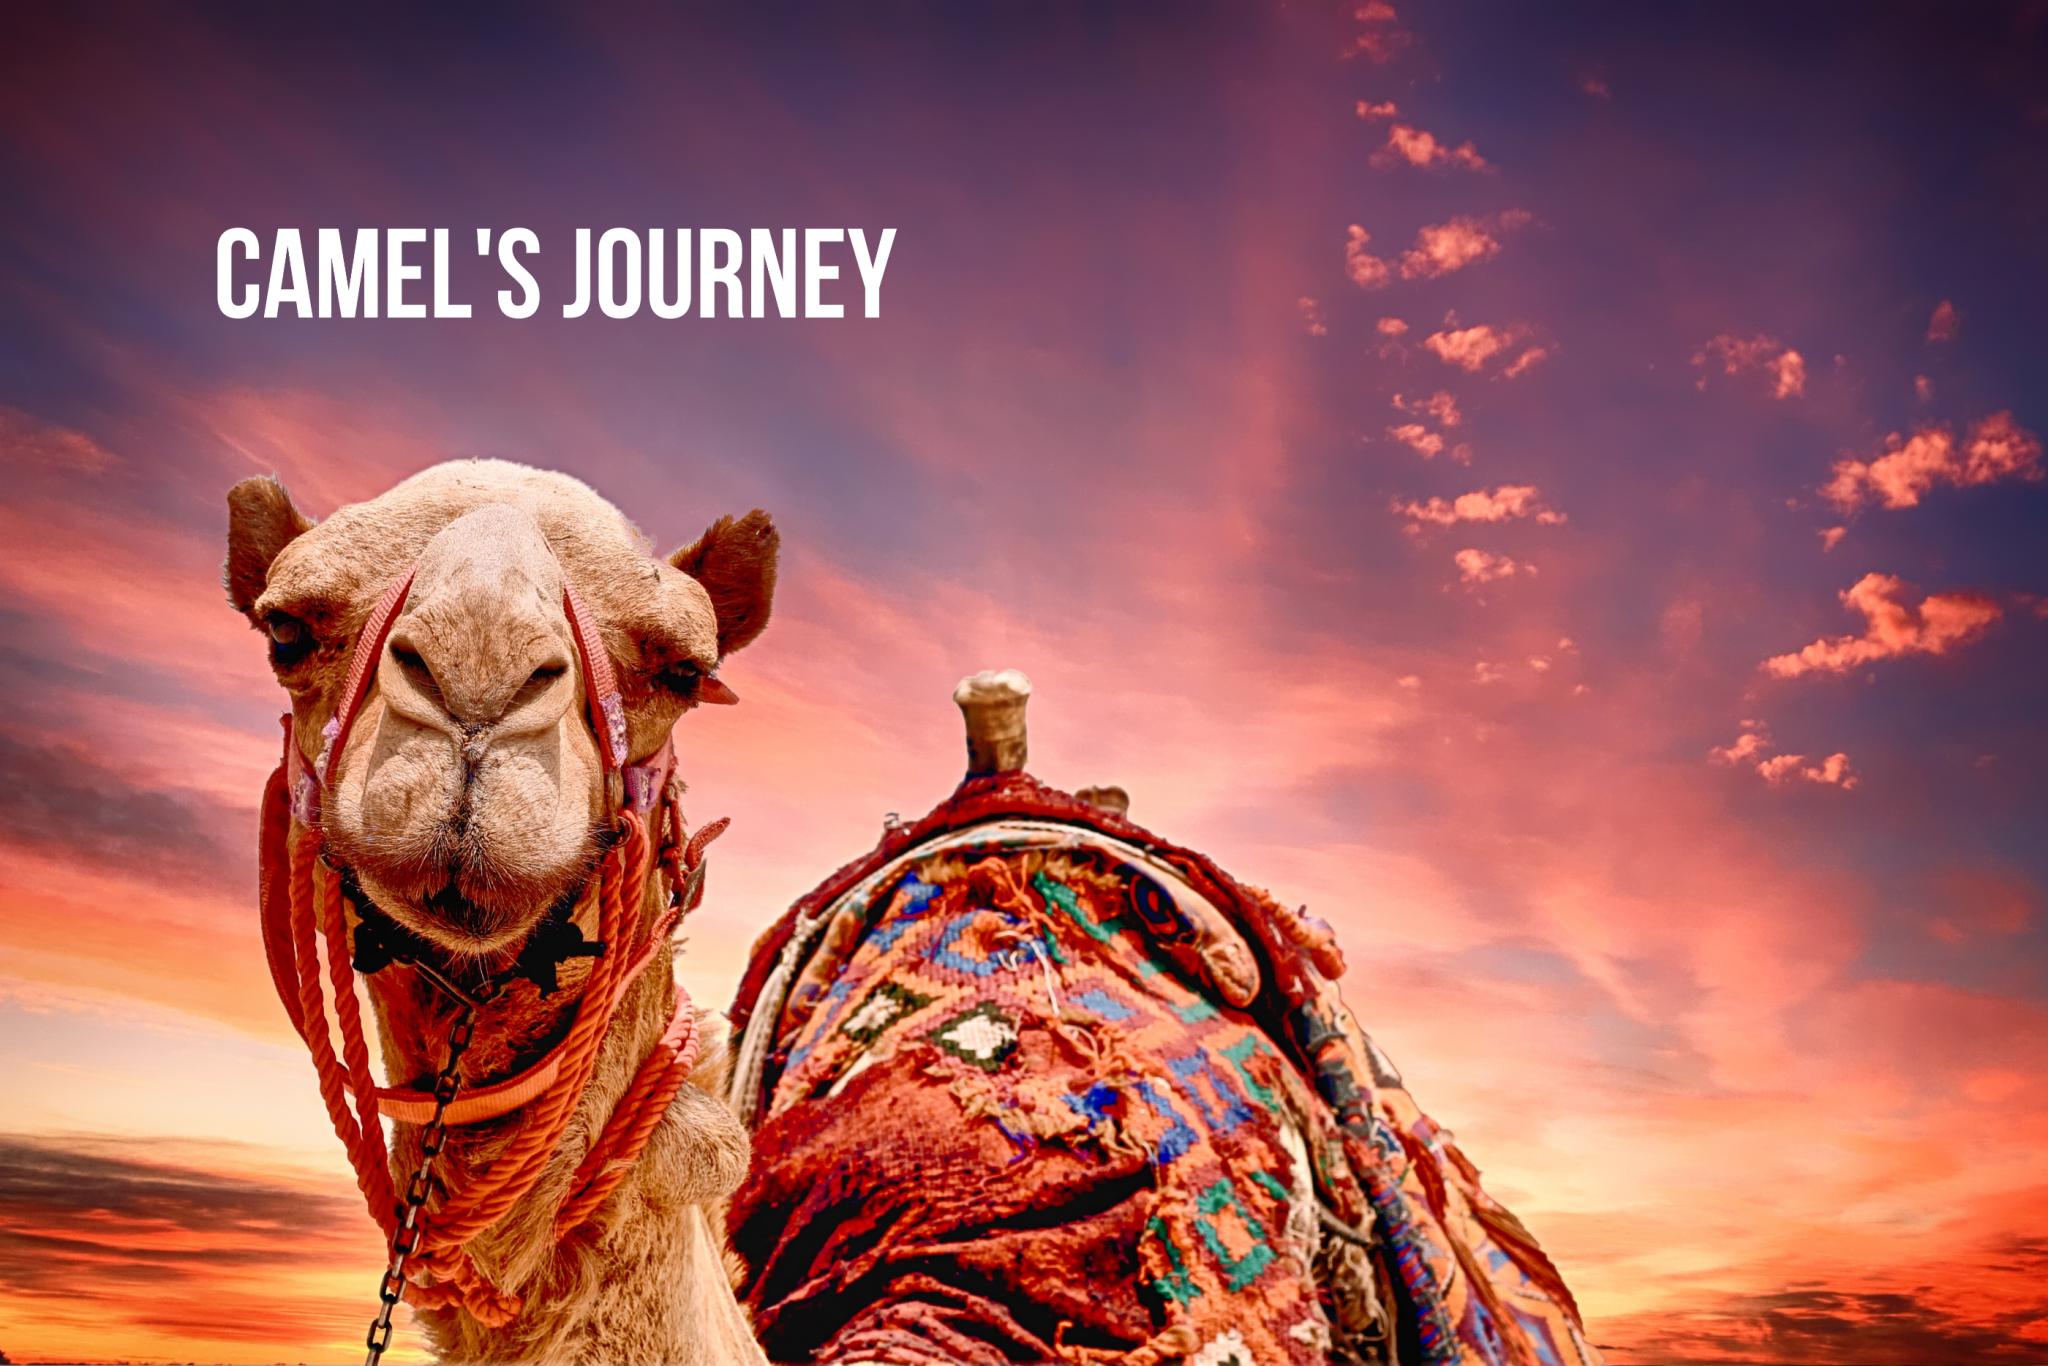 Camel's Journey (2011)